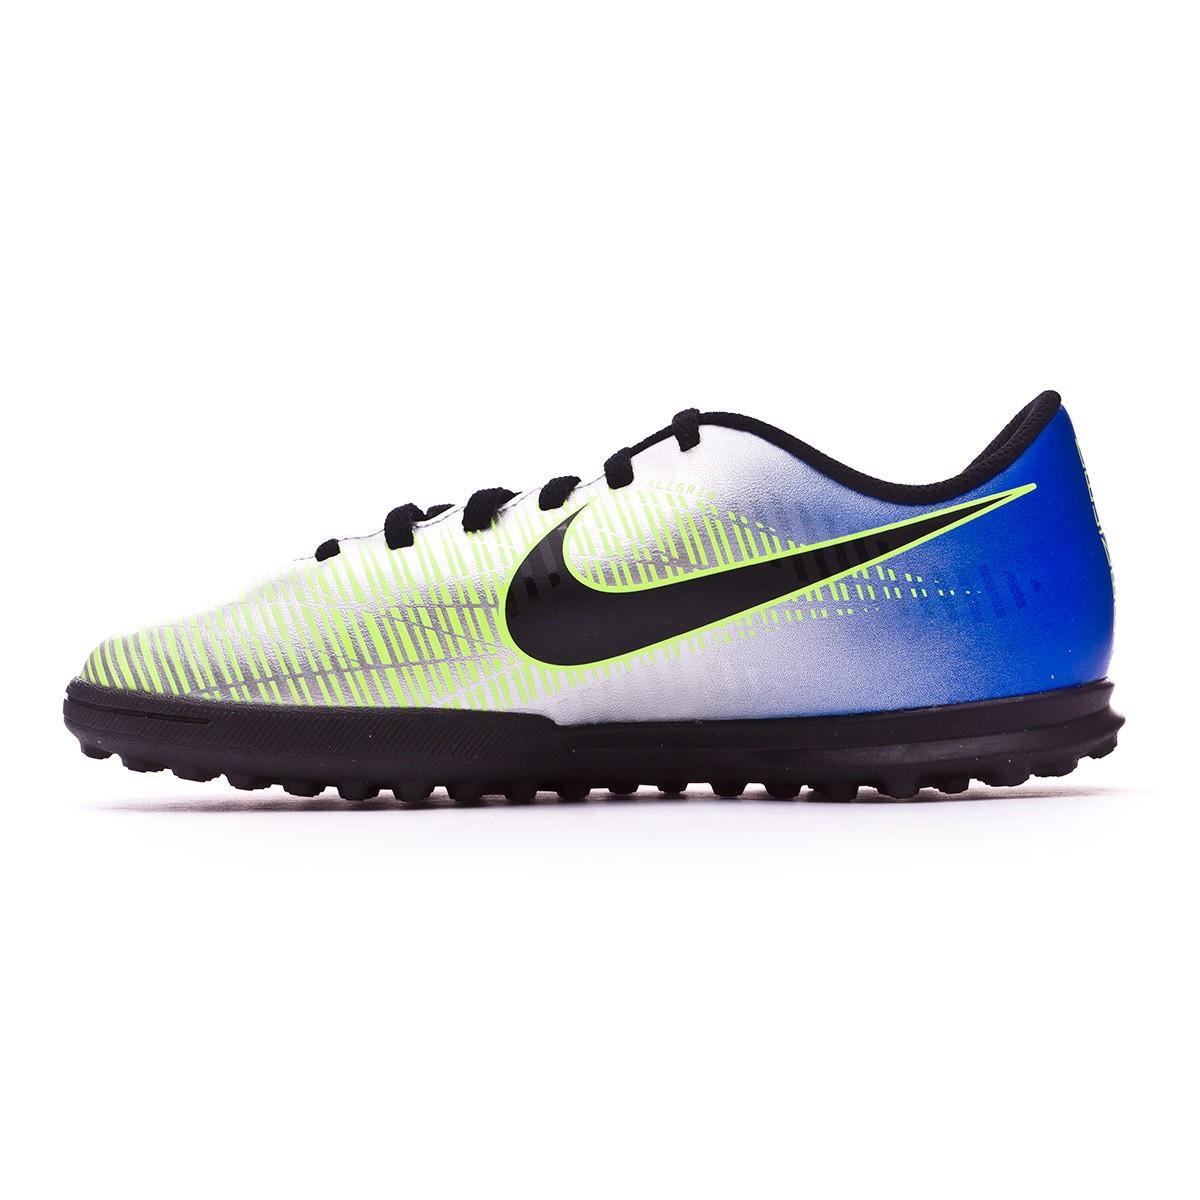 Tenis Nike MercurialX Vortex III Turf Neymar Niño Racer  blue-Black-Chrome-Volt - Soloporteros es ahora Fútbol Emotion 149bf6b5caacb